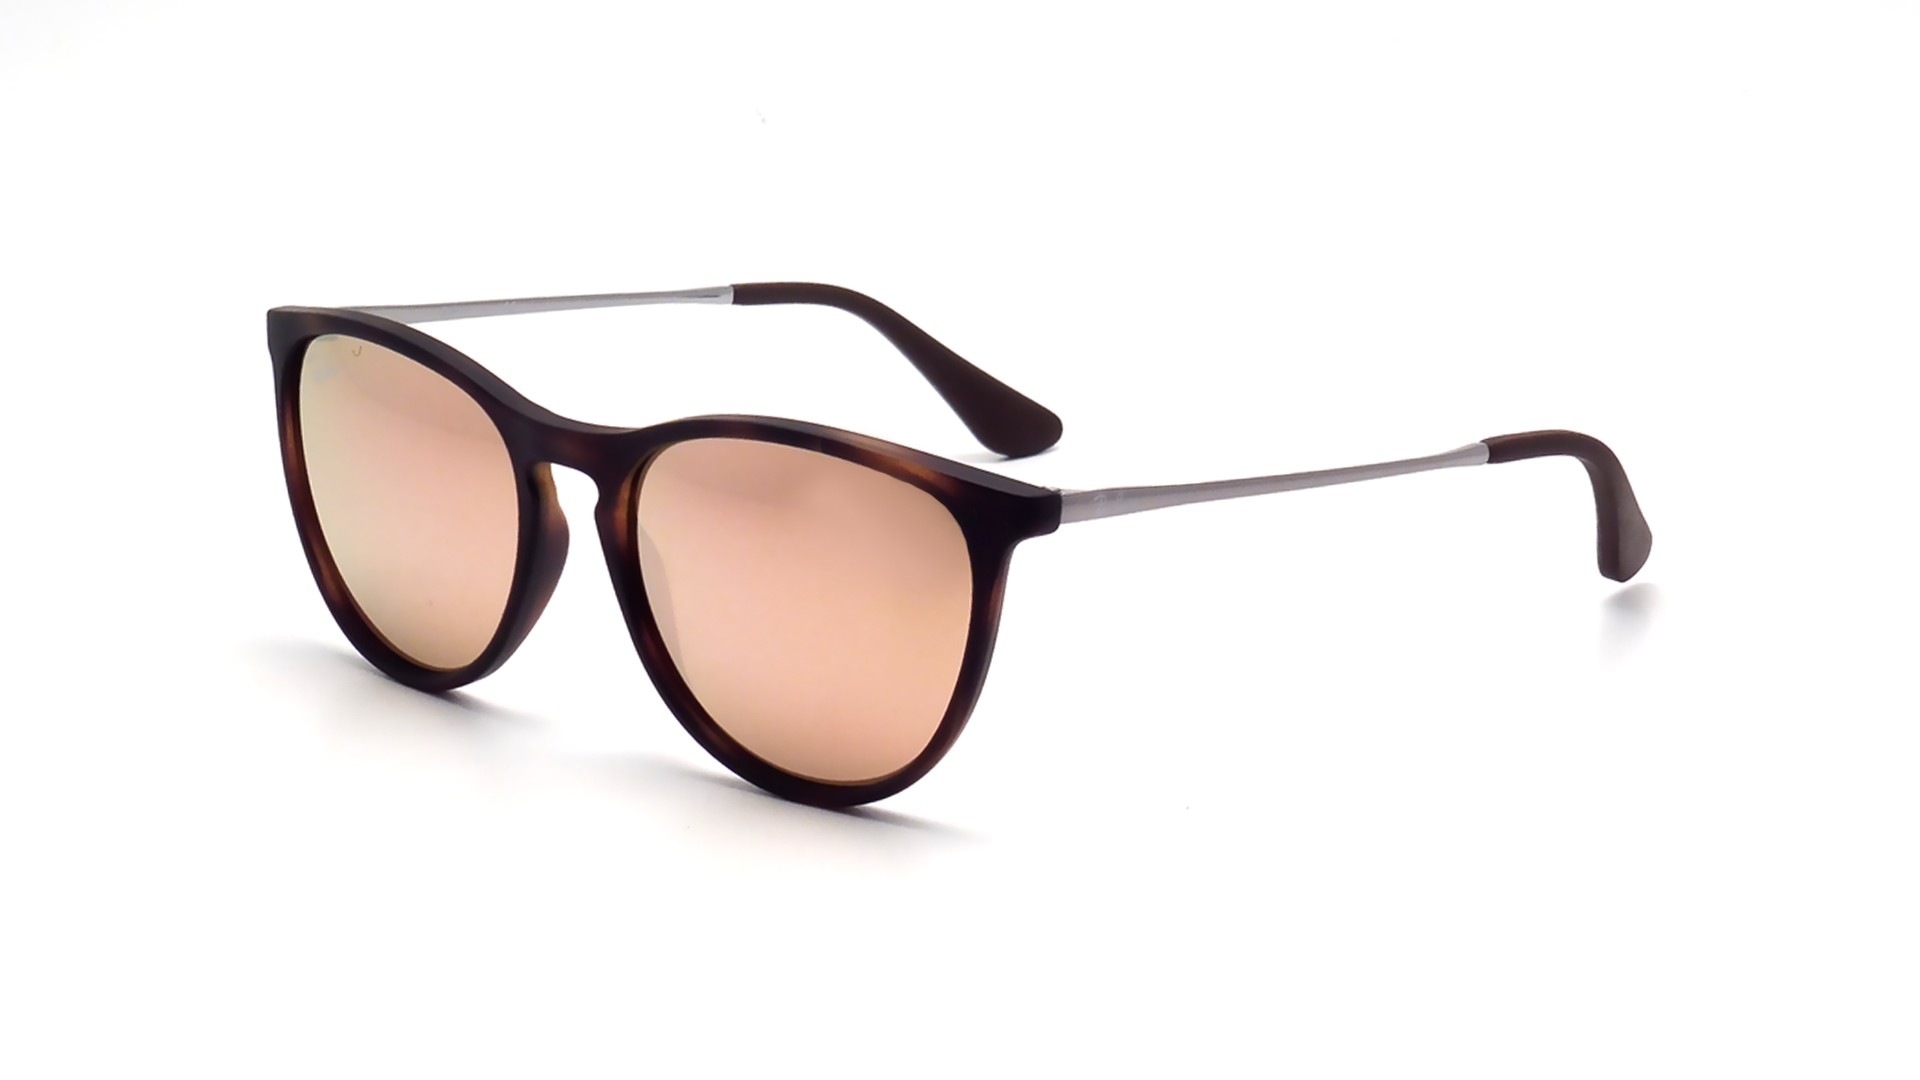 051eaa2c8b Sunglasses Ray-Ban Erika Havane Tortoise RJ9060S 70062Y 50-15 Junior Mirror